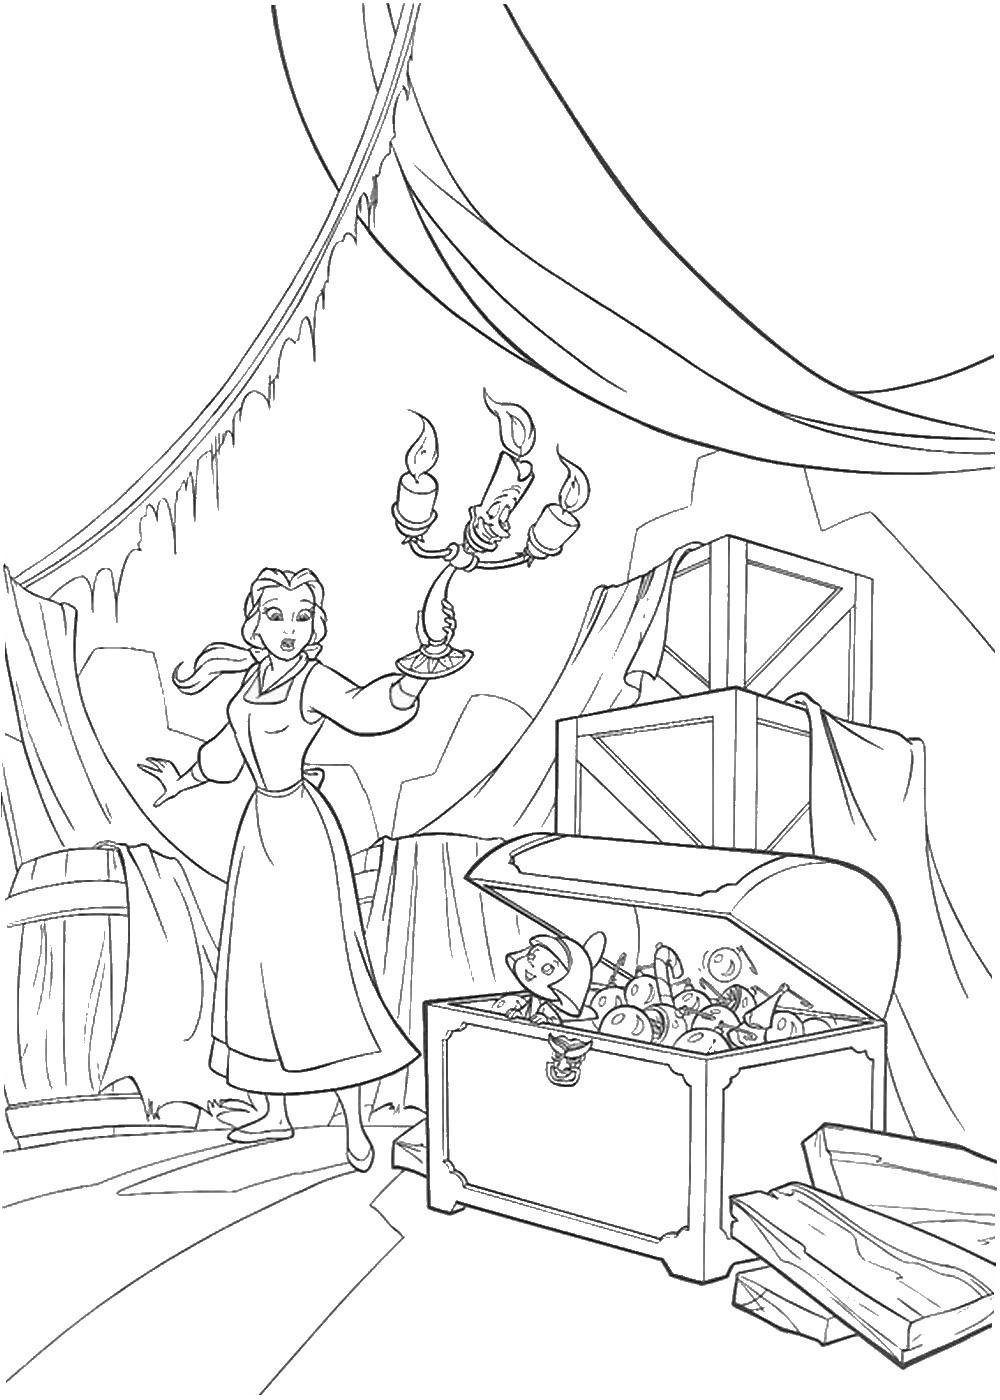 Белль в замке - раскраска №13193 | Printonic.ru